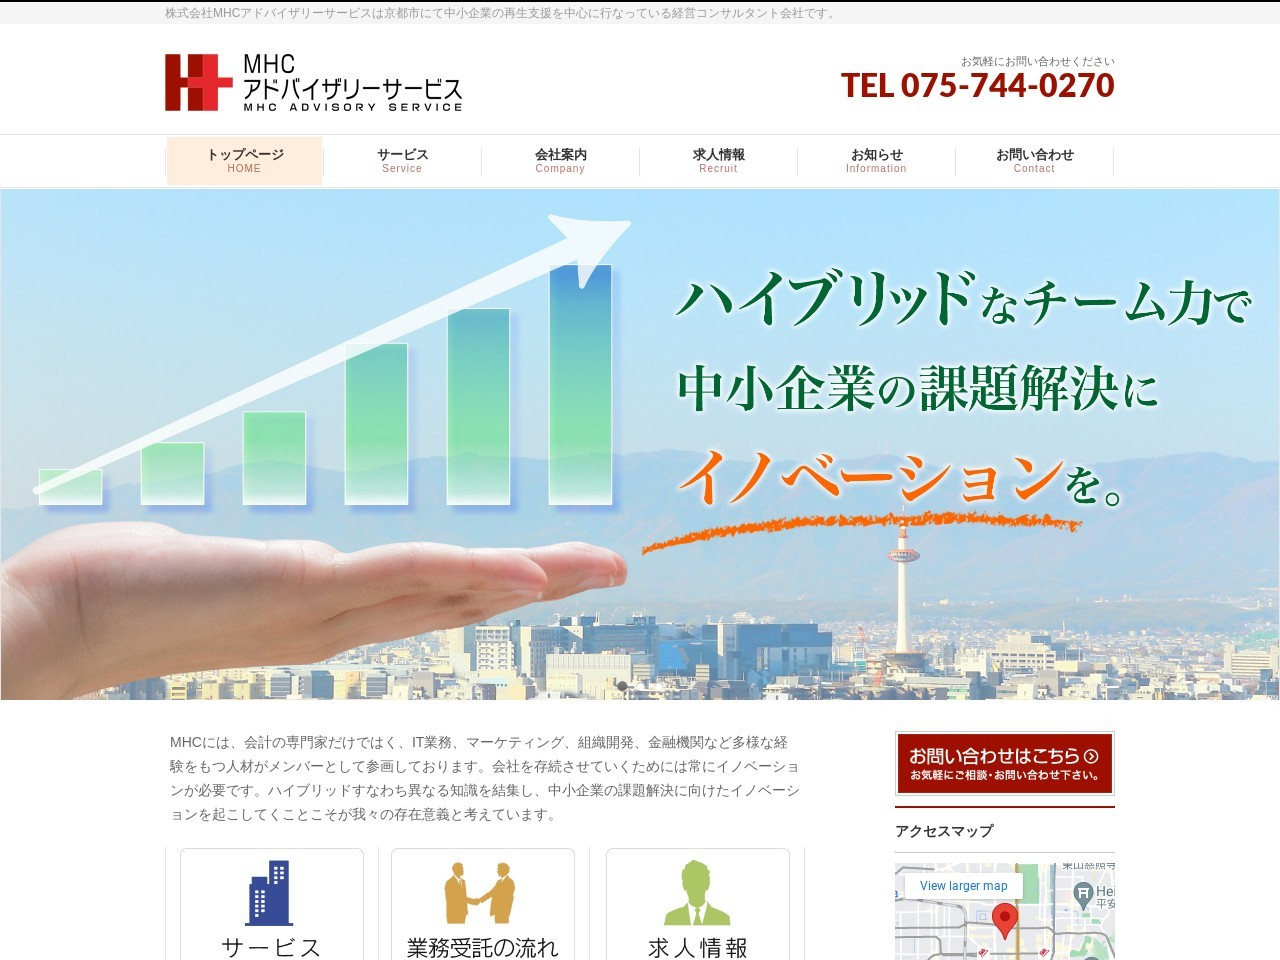 MHC(税理士法人)